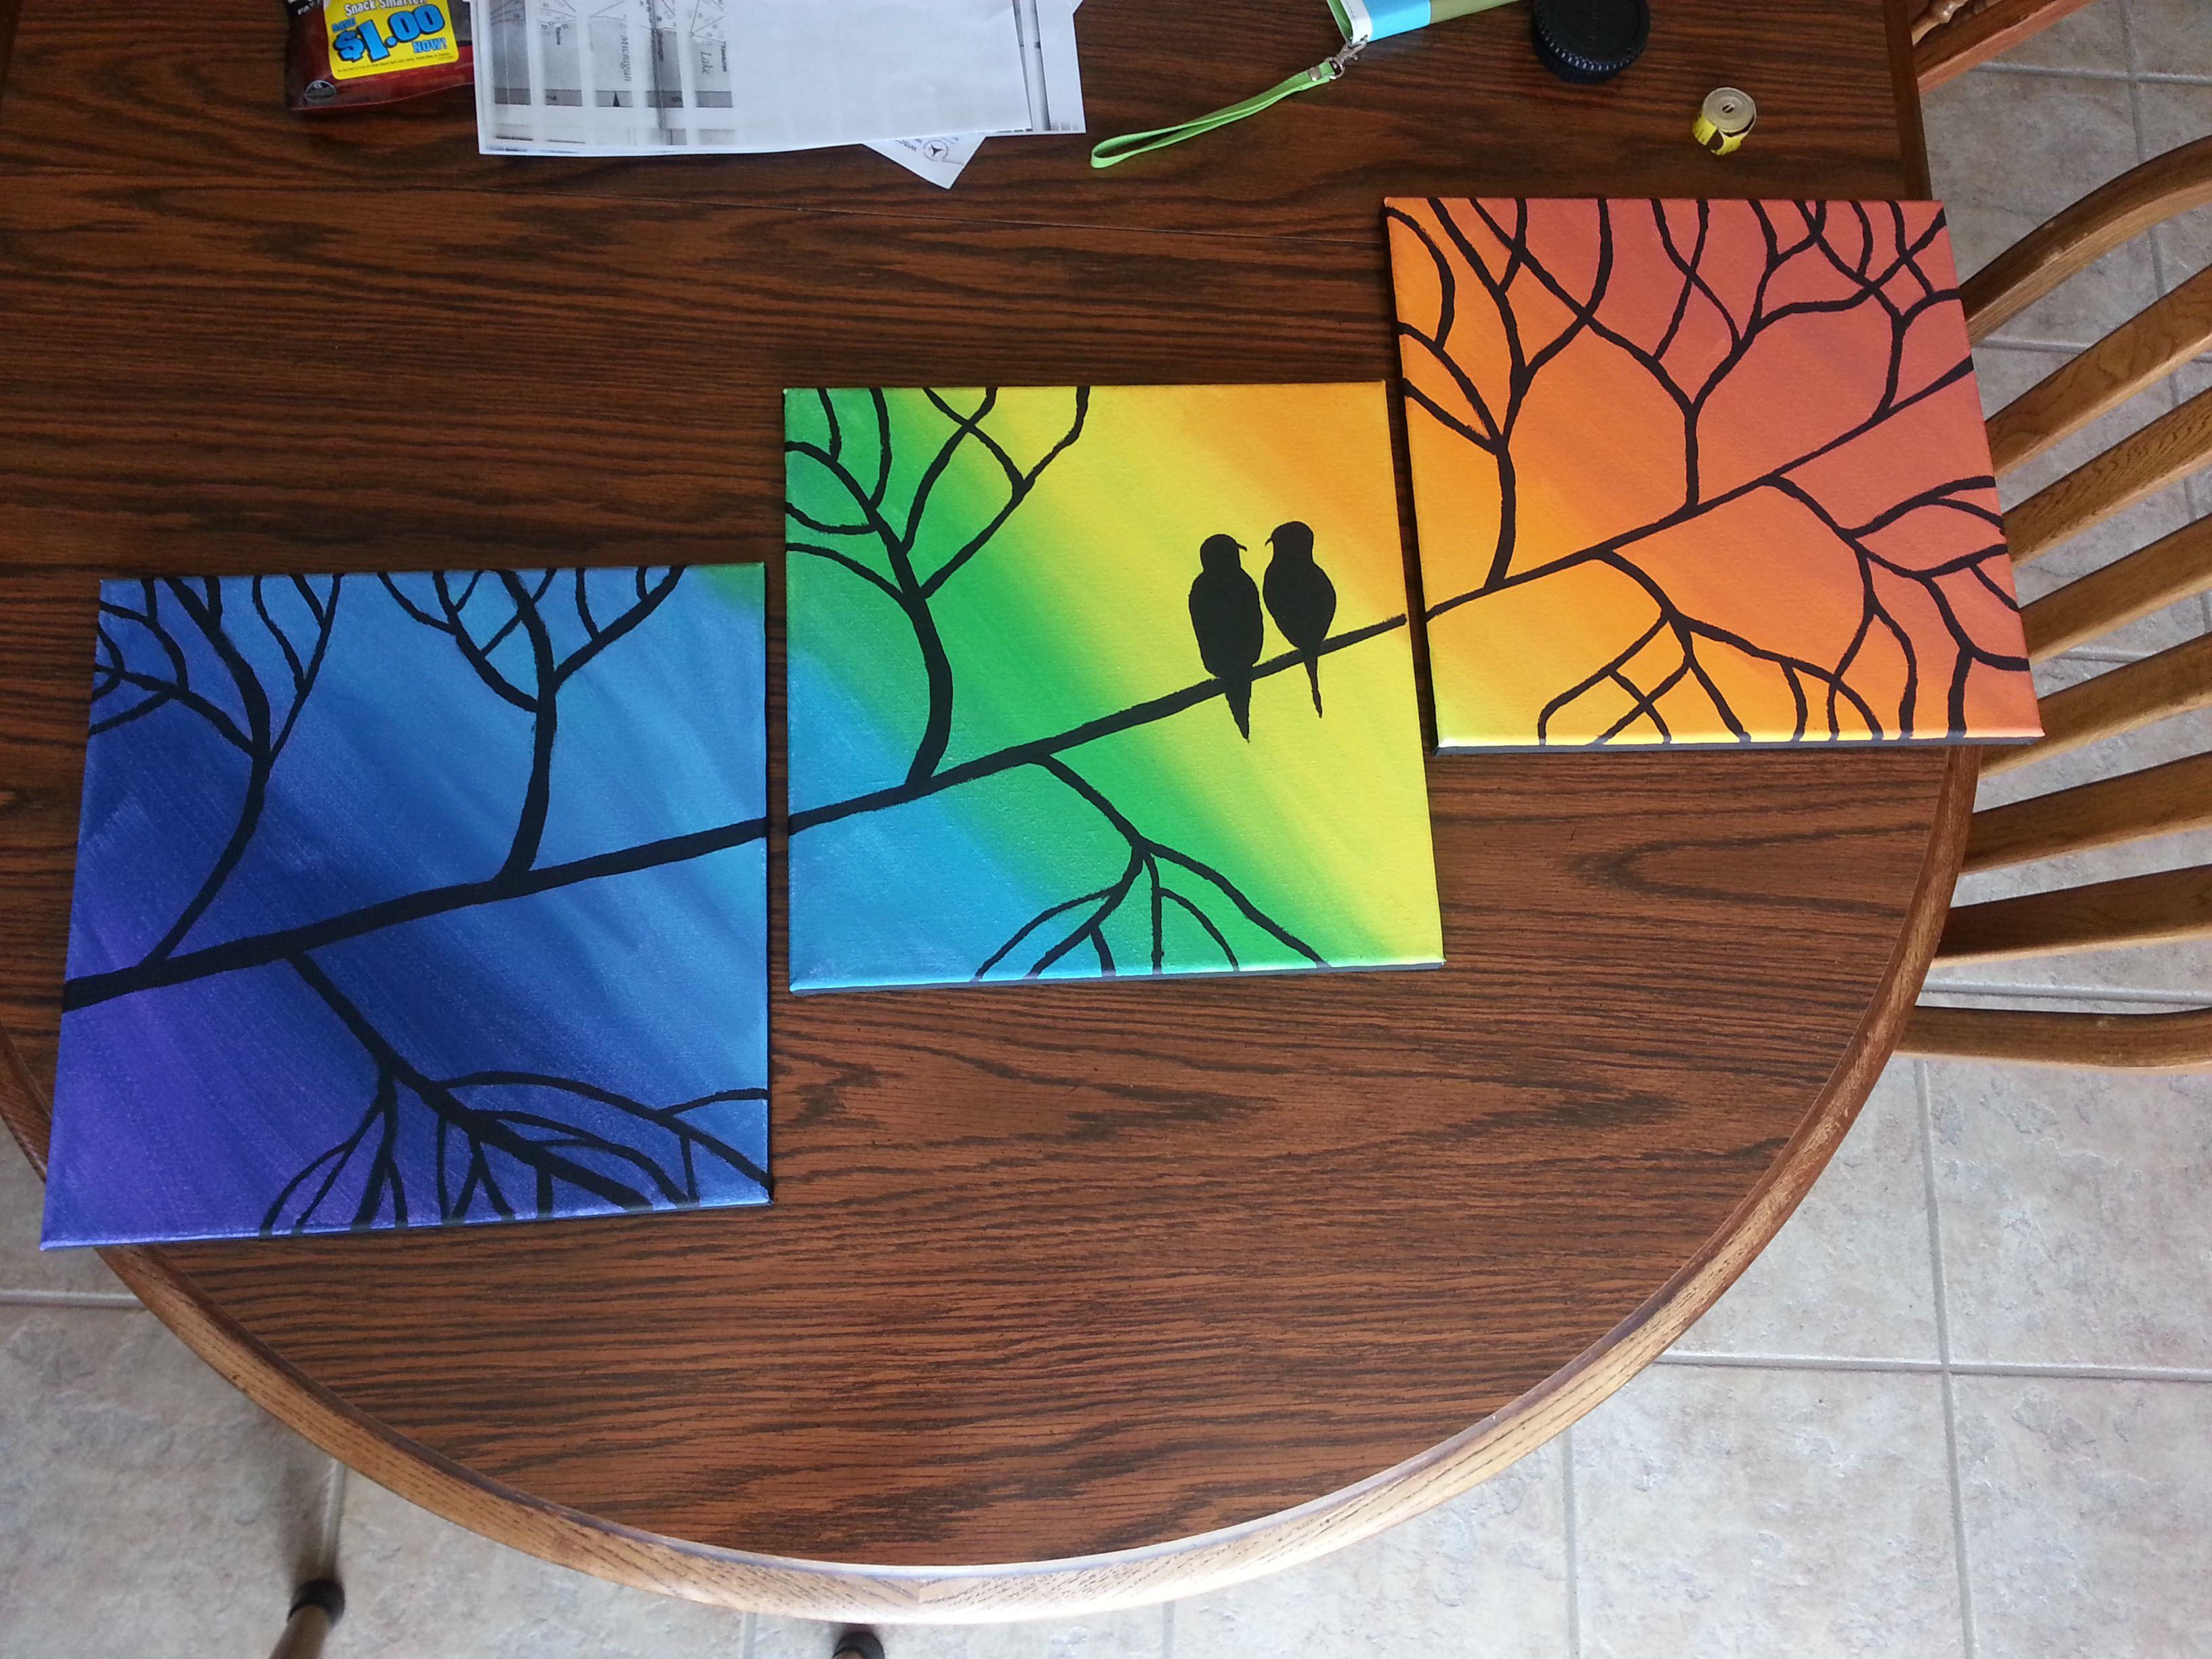 Diy Canvas Painting Diy Multi Panel Canvas Painting Diy Pinterest Diy Art And Craft